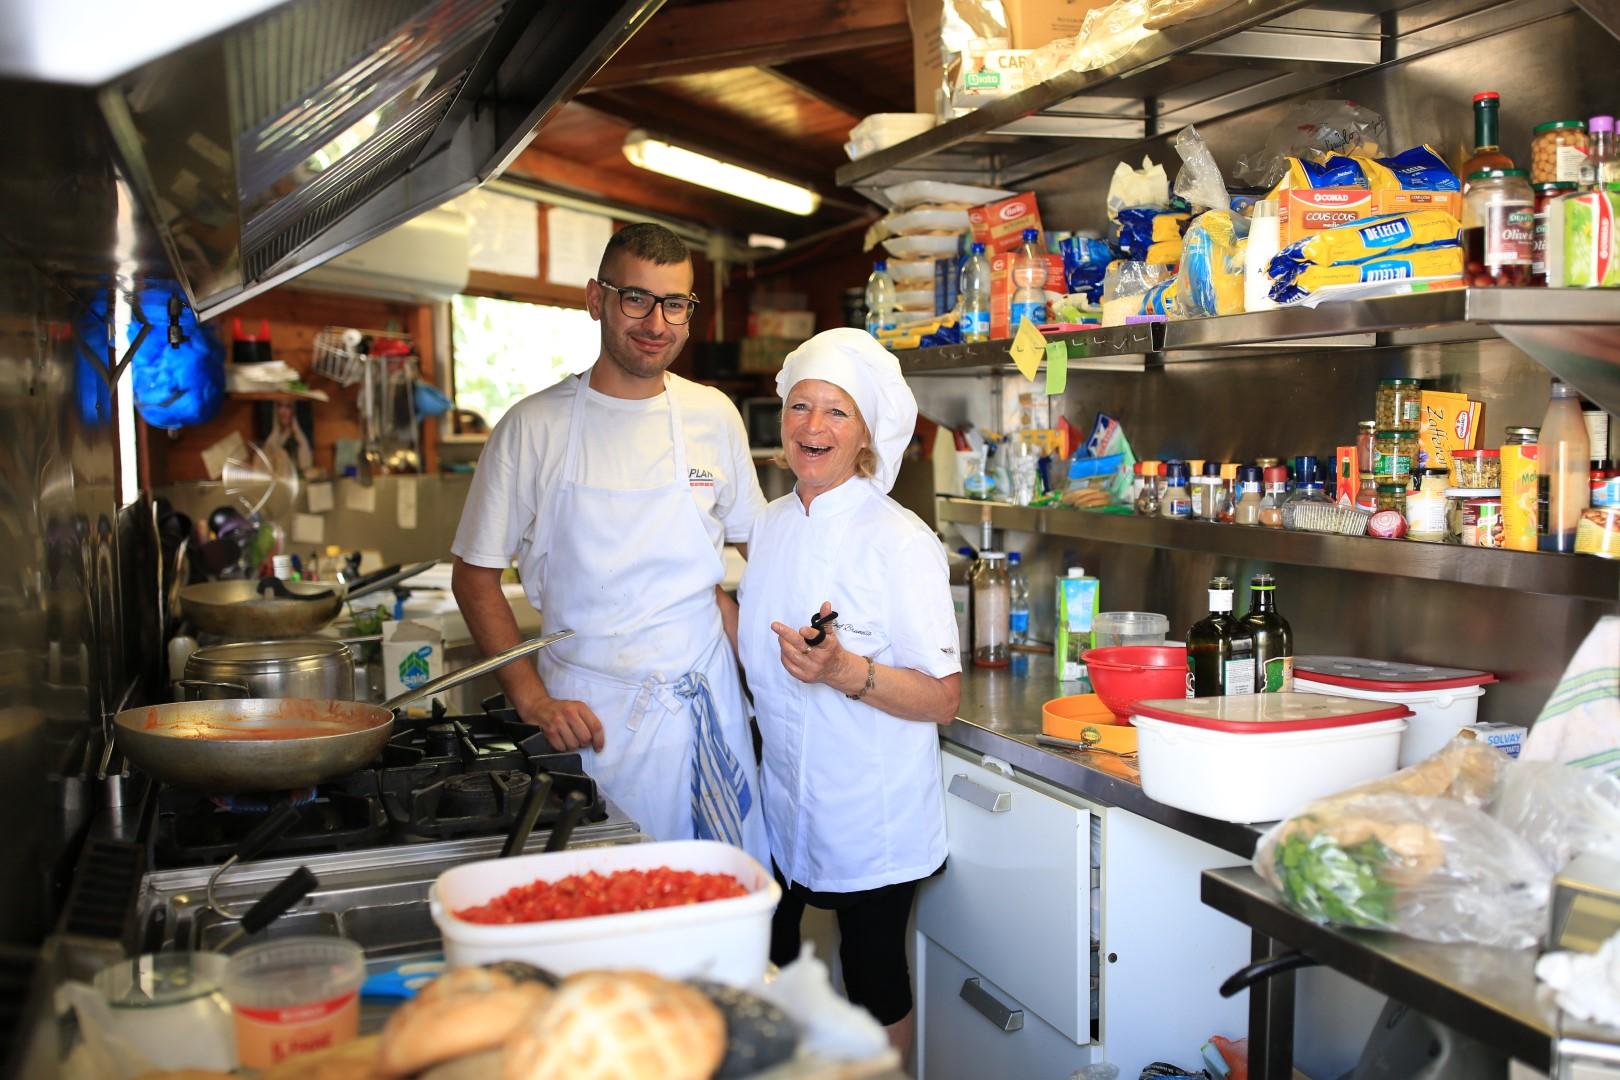 cucina-Brunella-slide